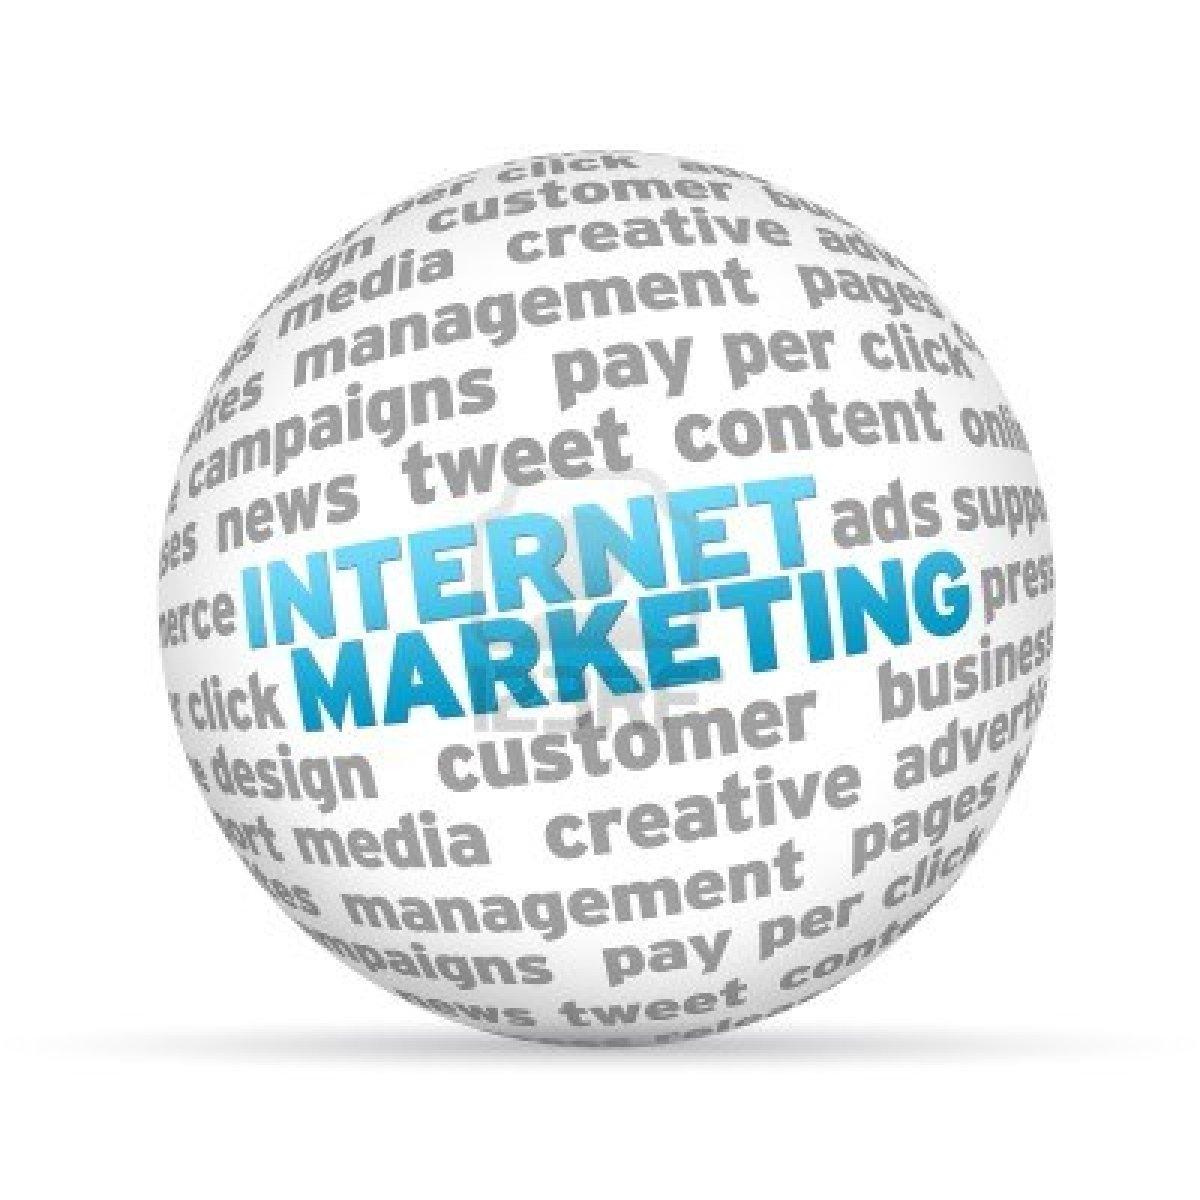 http://www.ernestoverdugo.com/wp-content/uploads/2013/08/Internet-Marketing-Strategies.jpg